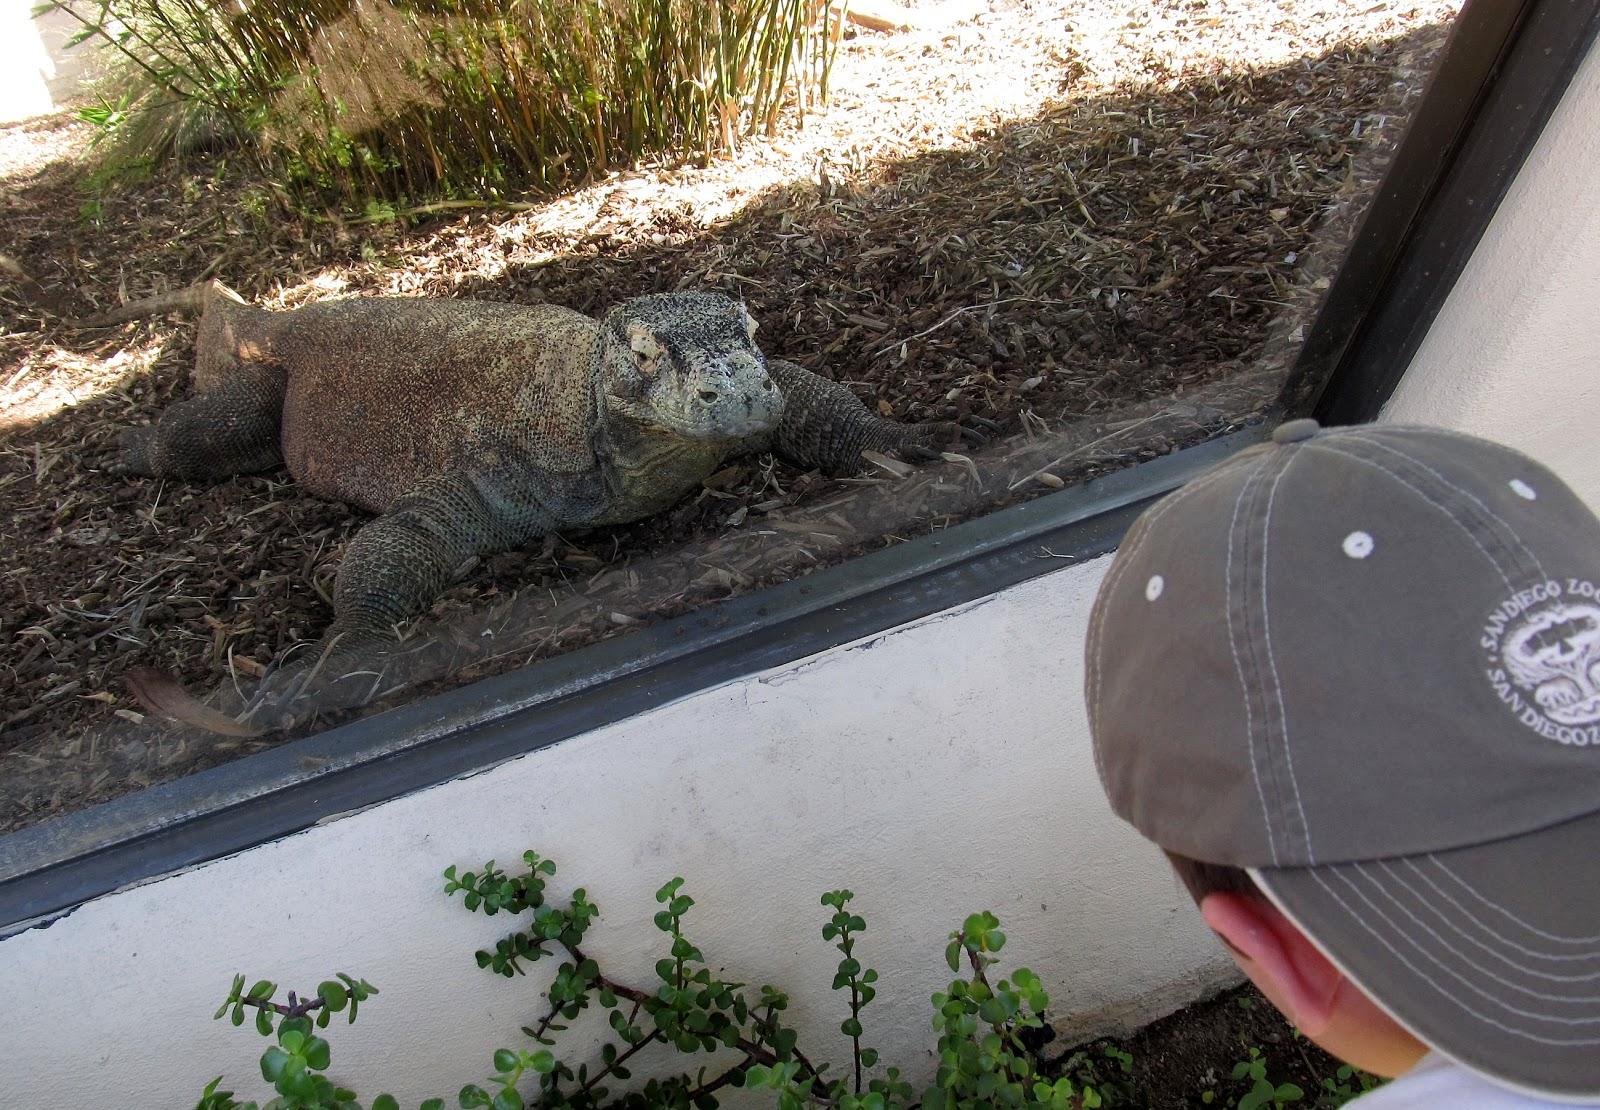 Komodo Dragon Endangered List